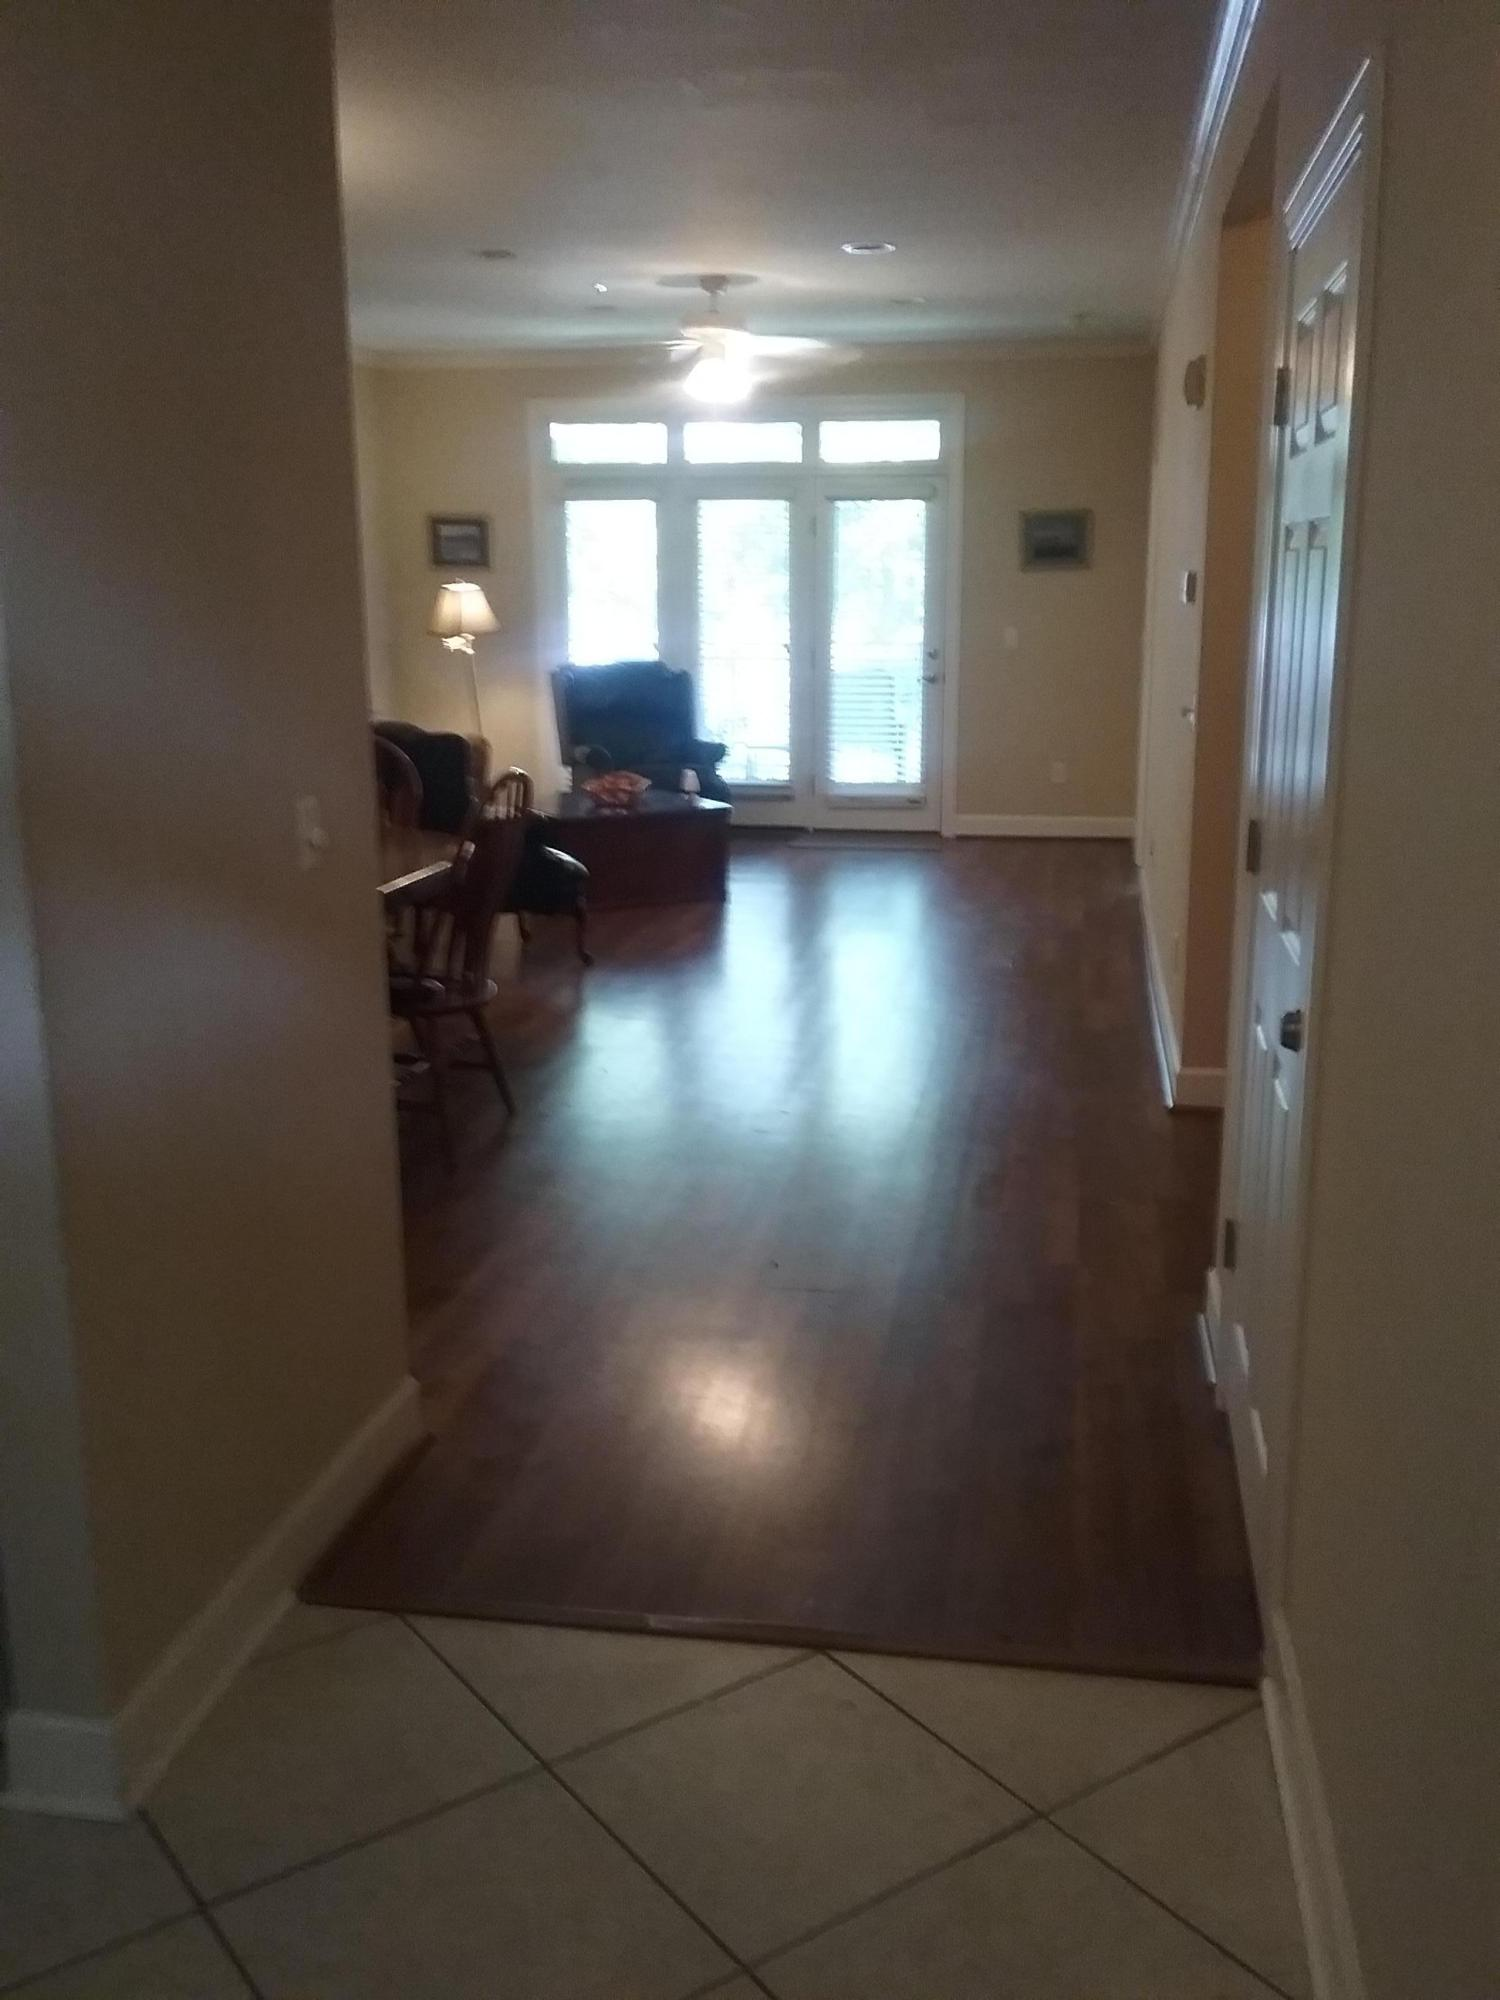 Ballards Pointe II Homes For Sale - 103 Ballard, Santee, SC - 2